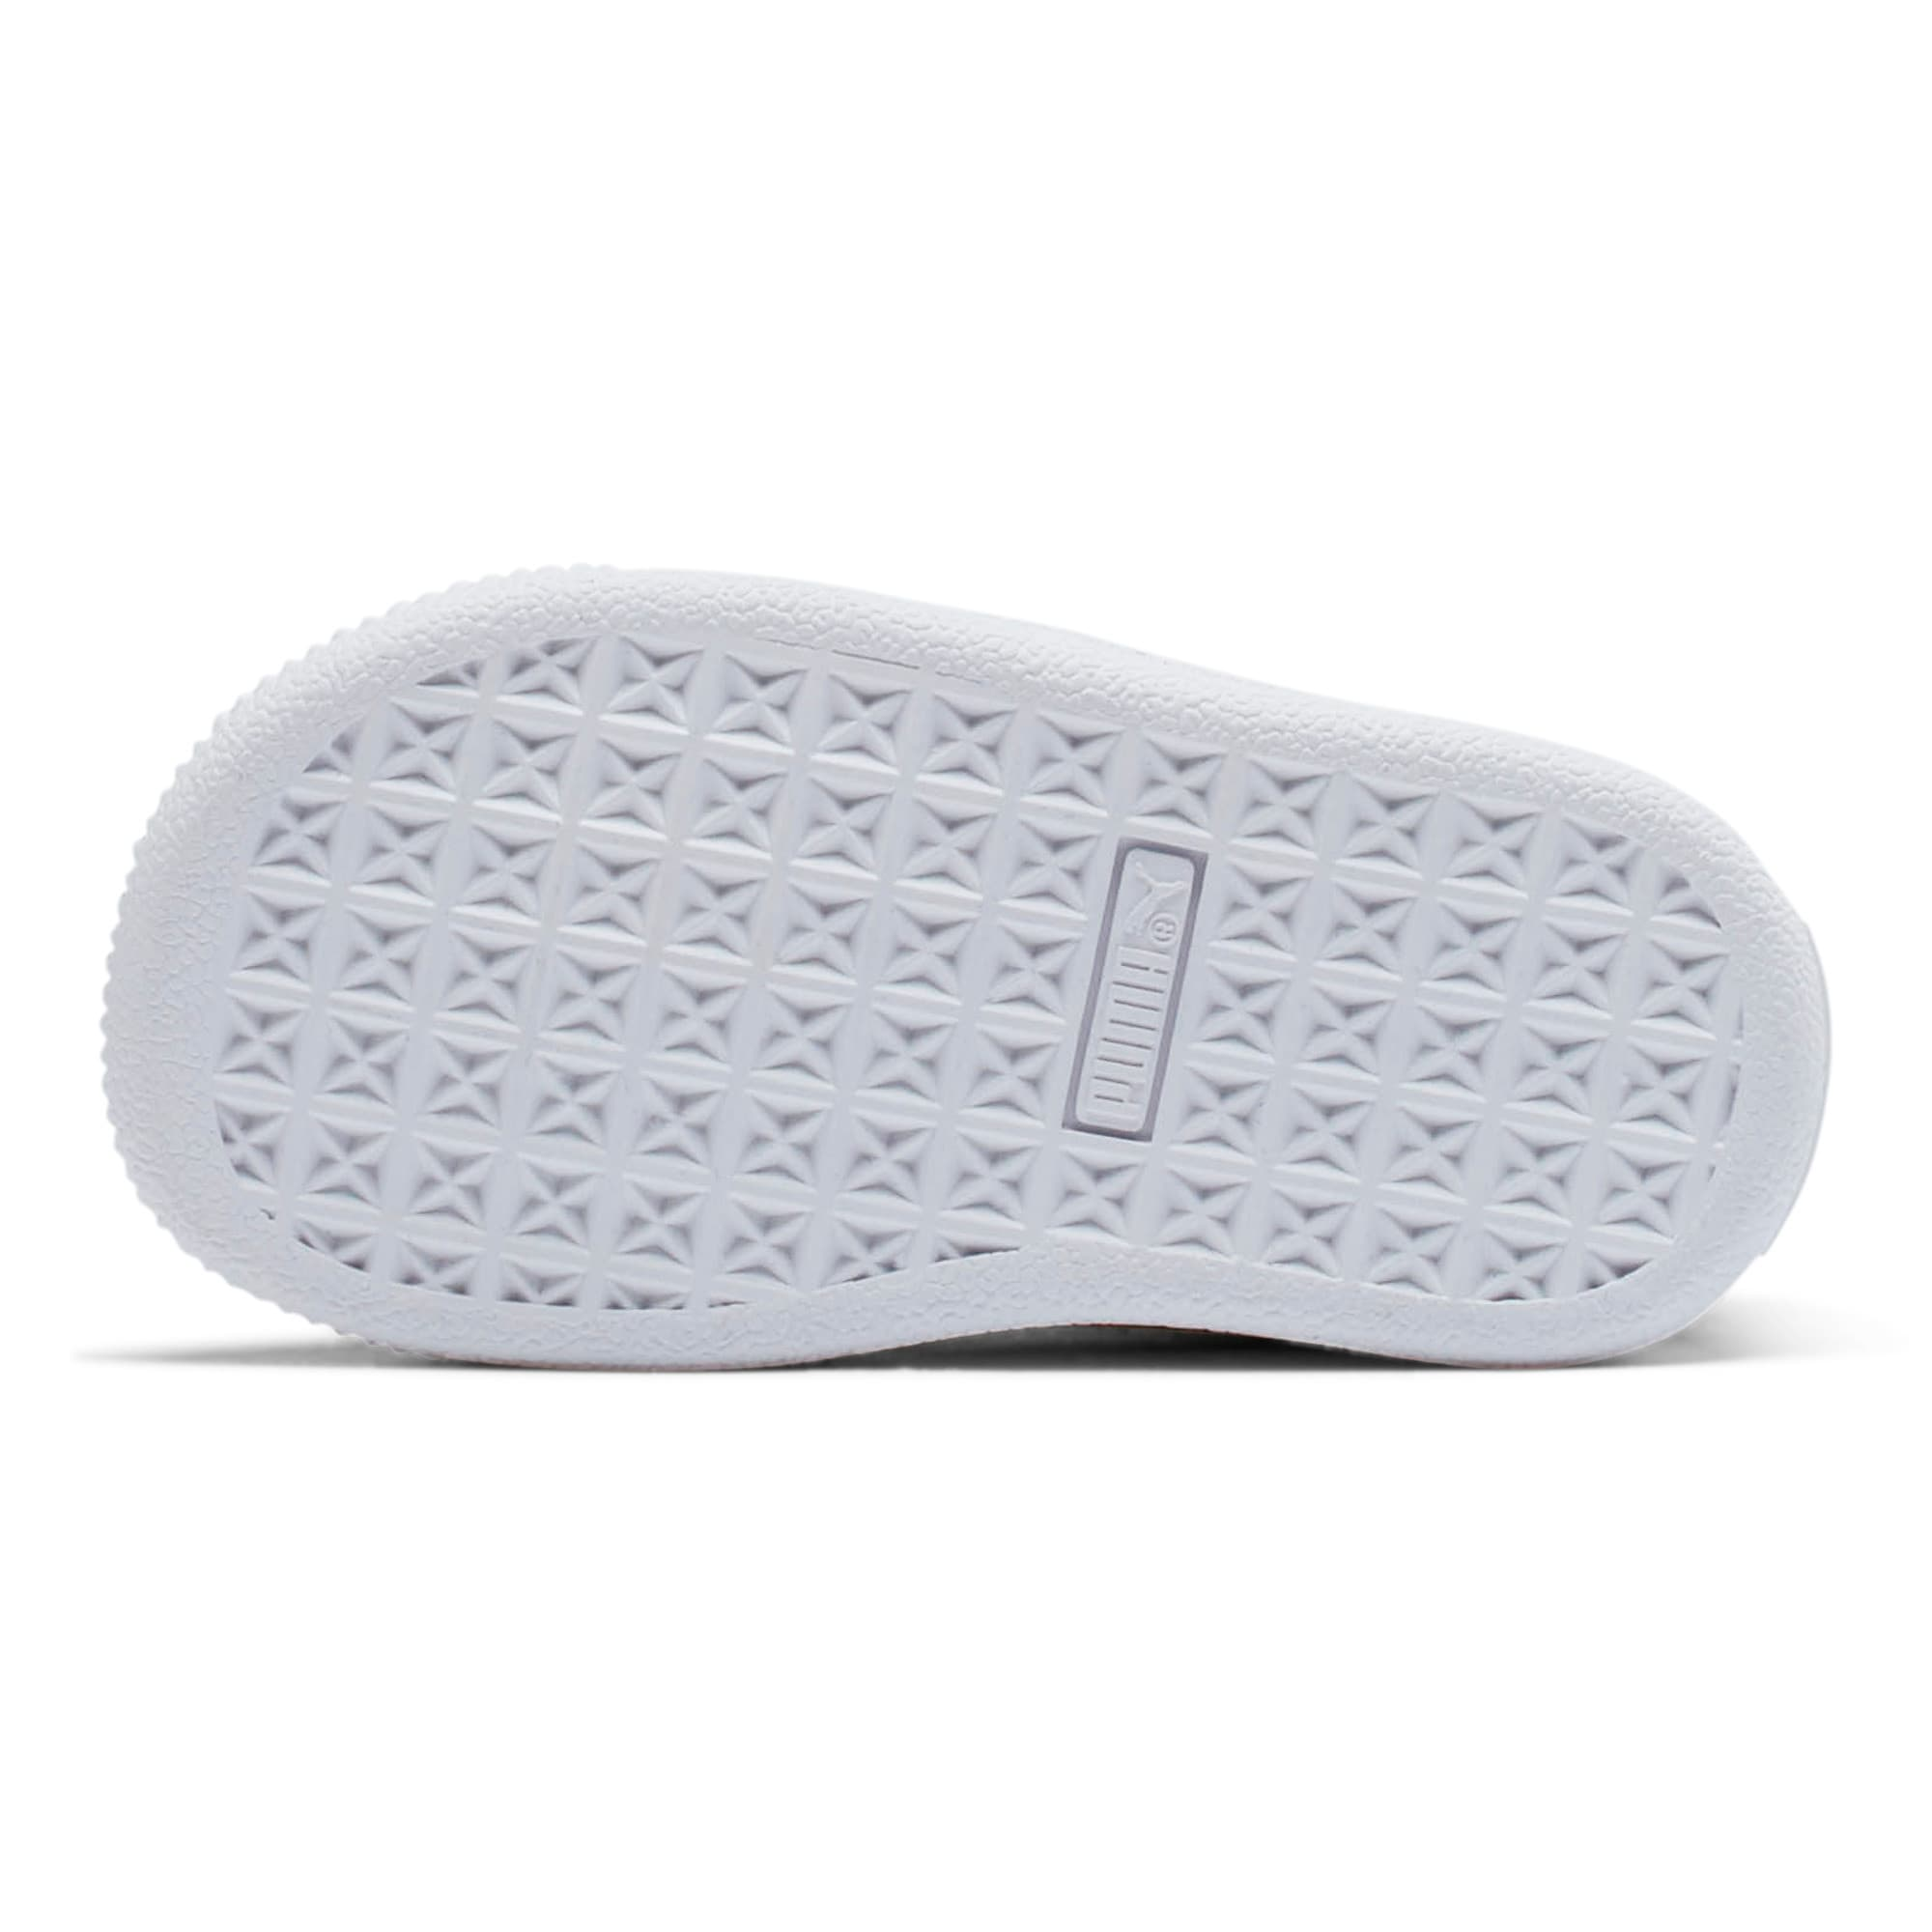 Thumbnail 3 of Puma Suede Toddler Shoes, Snorkel Blue-Puma White, medium